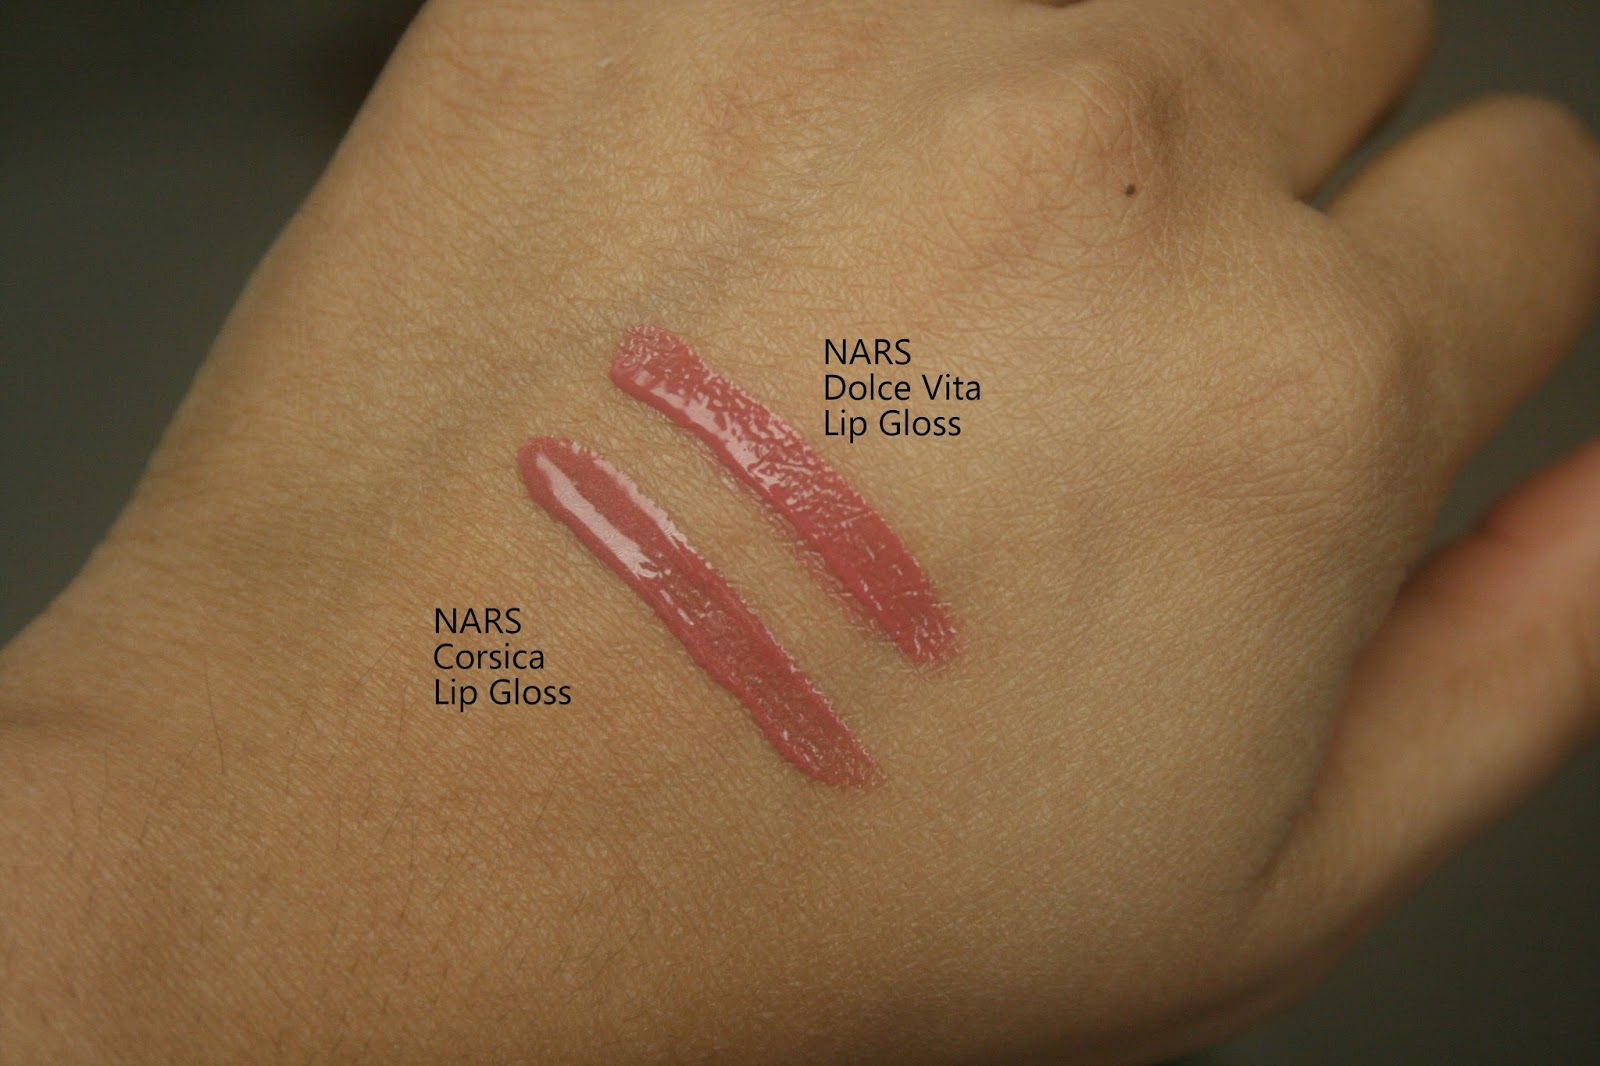 Makeup, Beauty and More: NARS Corsica Lip Gloss and ...  Makeup, Beauty ...